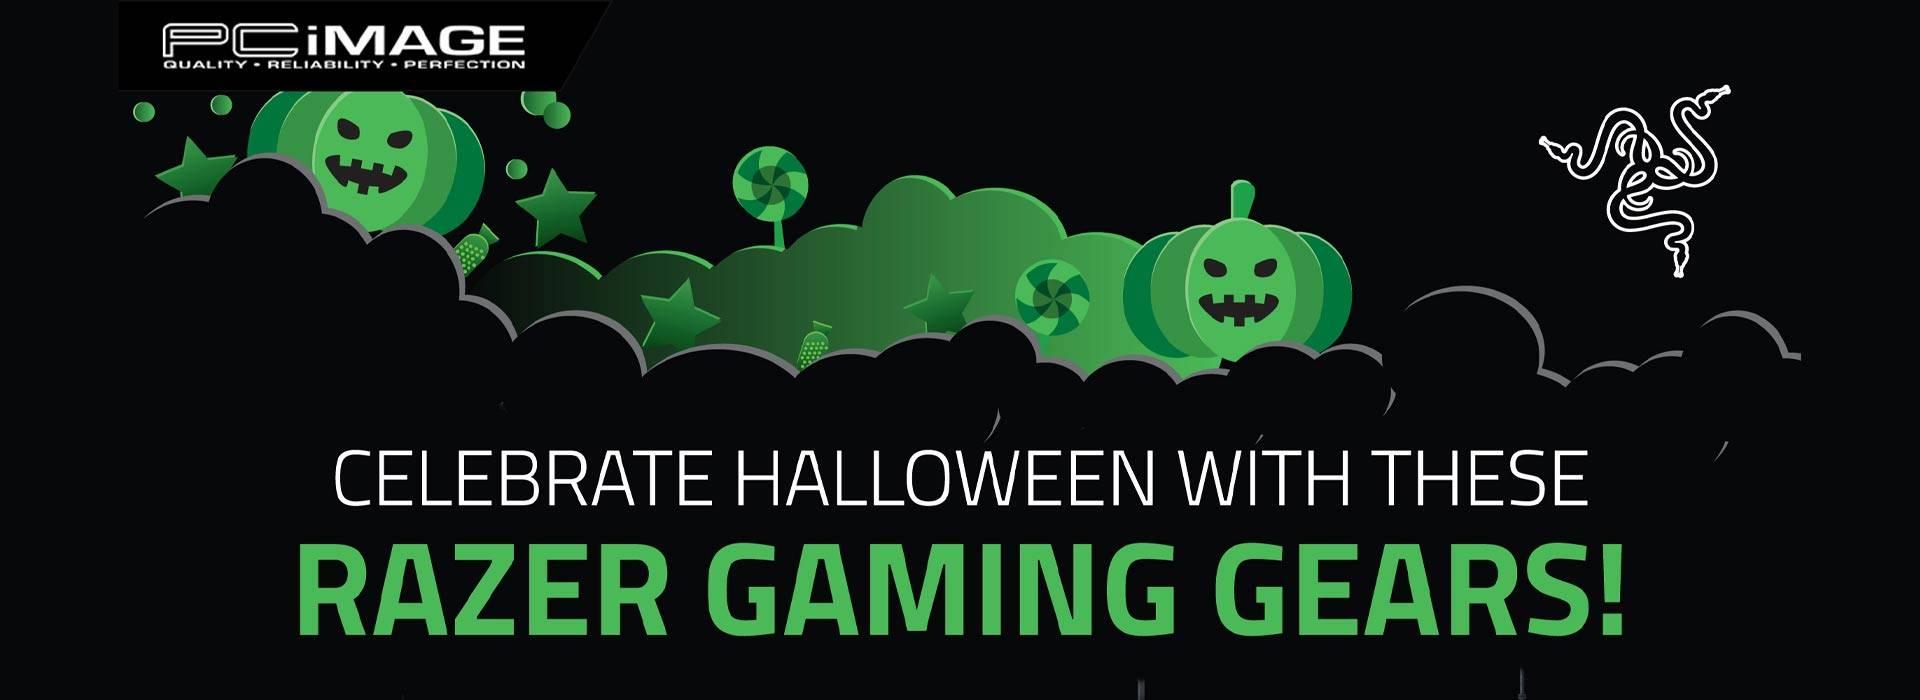 Razer Hallowen 2021 Promo 31 Oct